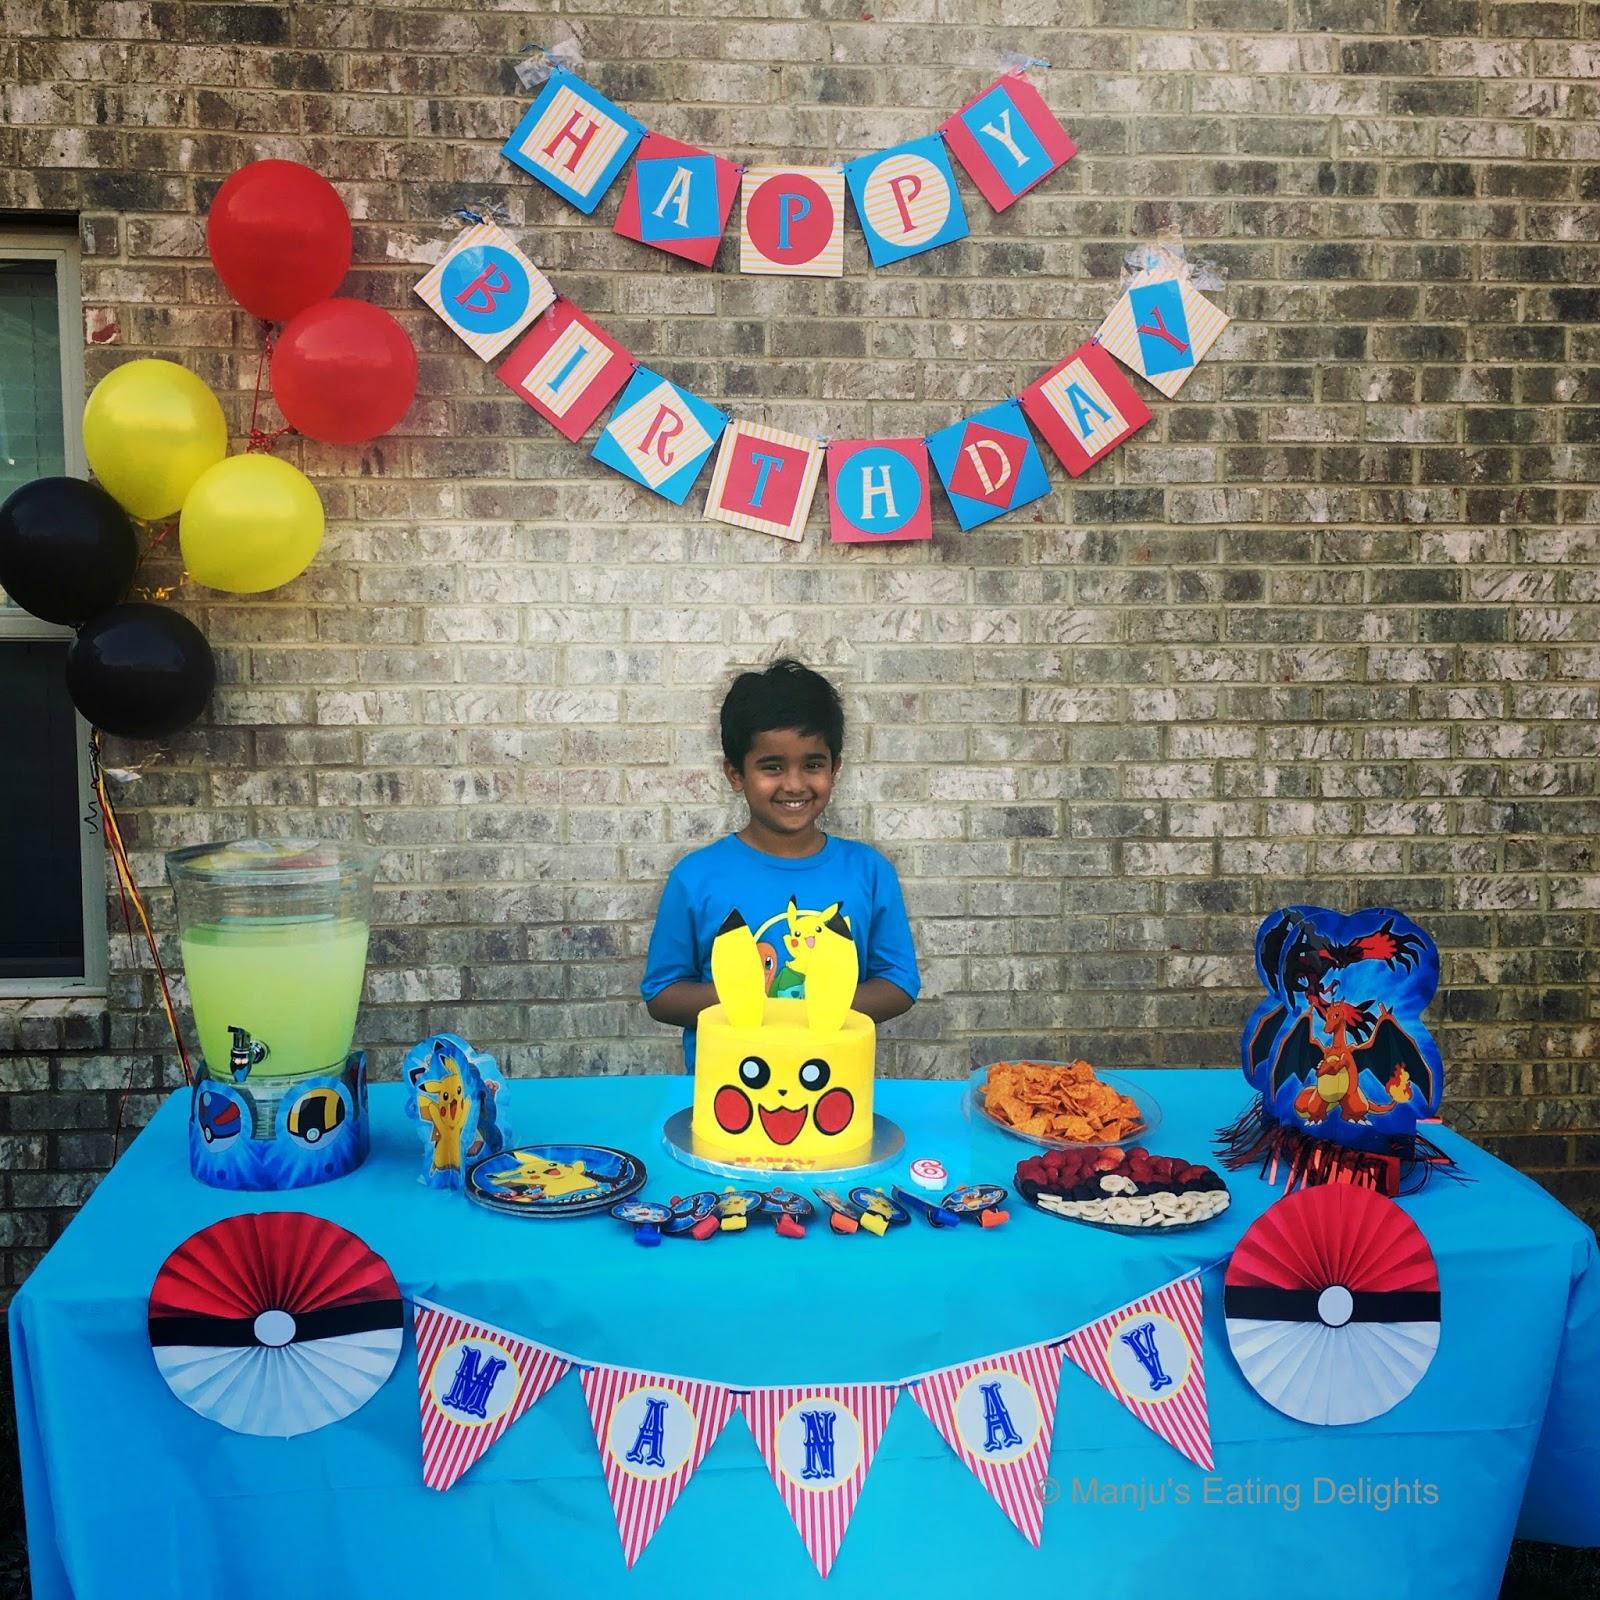 Manju s Eating Delights Pokémon themed birthday